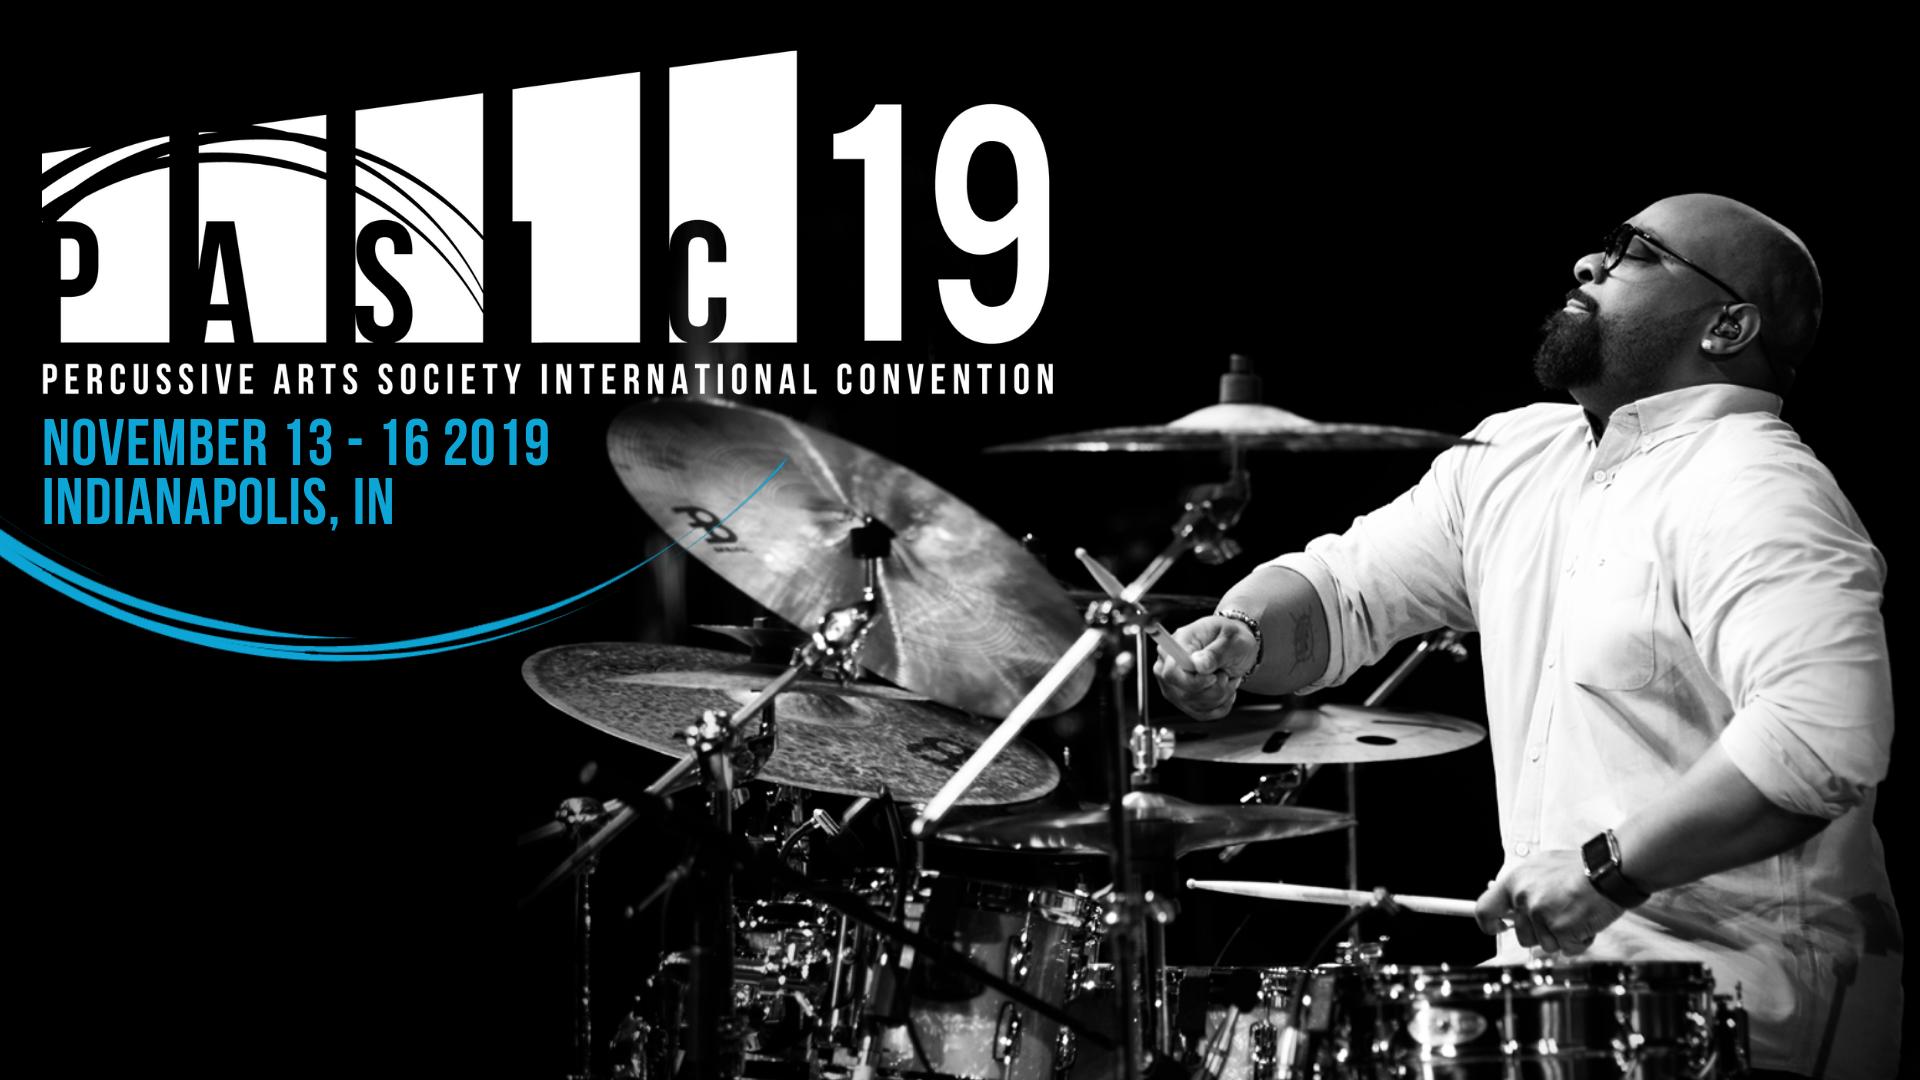 PASIC 2019 Schedule Saturday | PASIC®